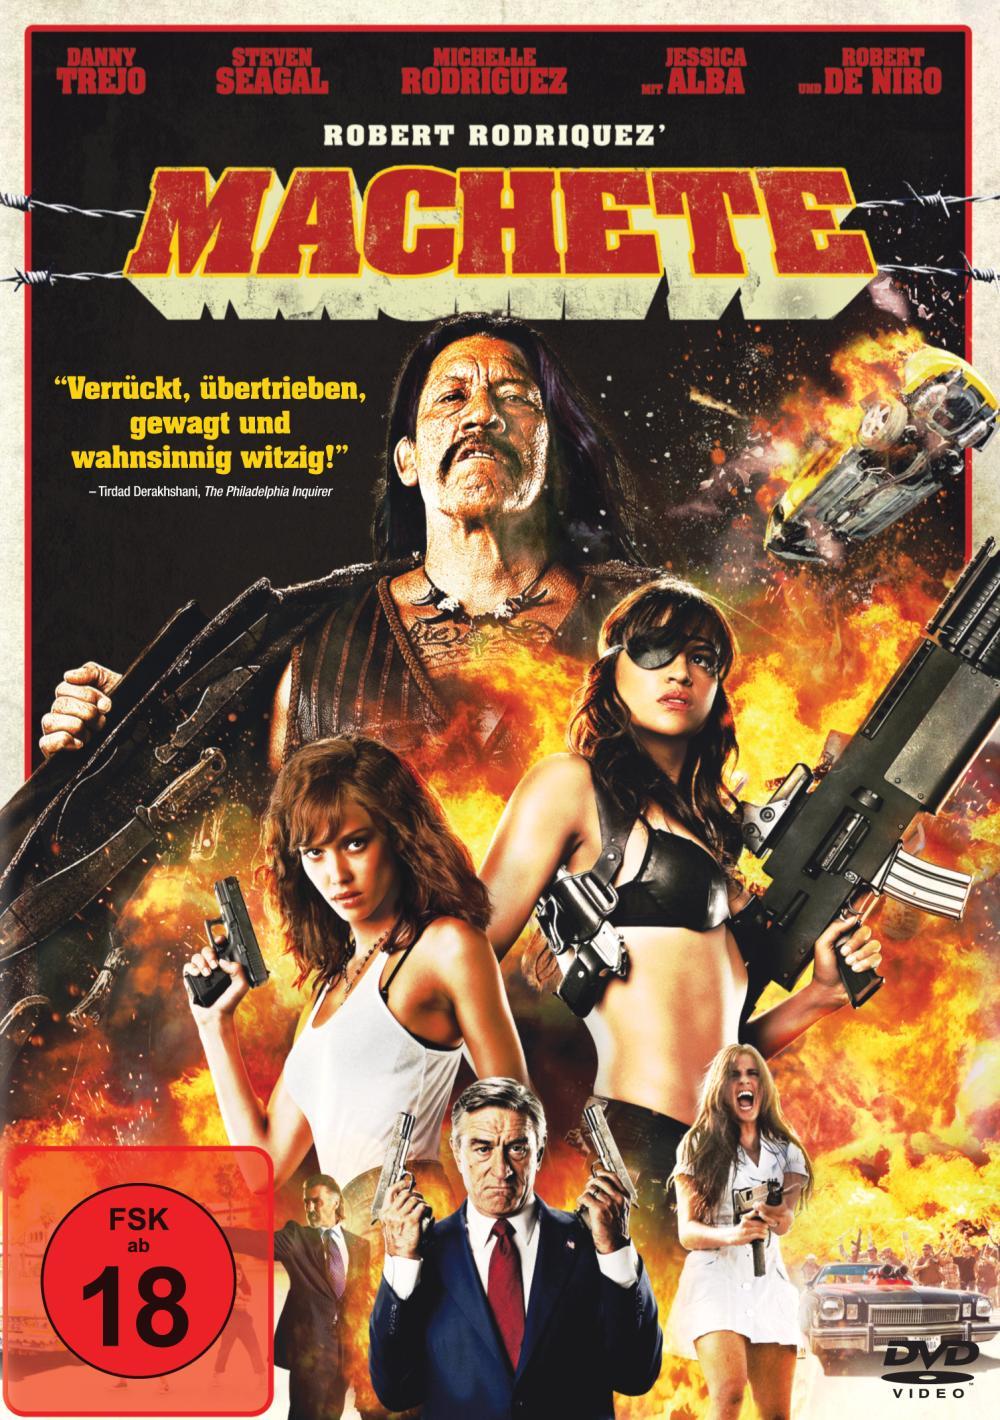 Film Machete